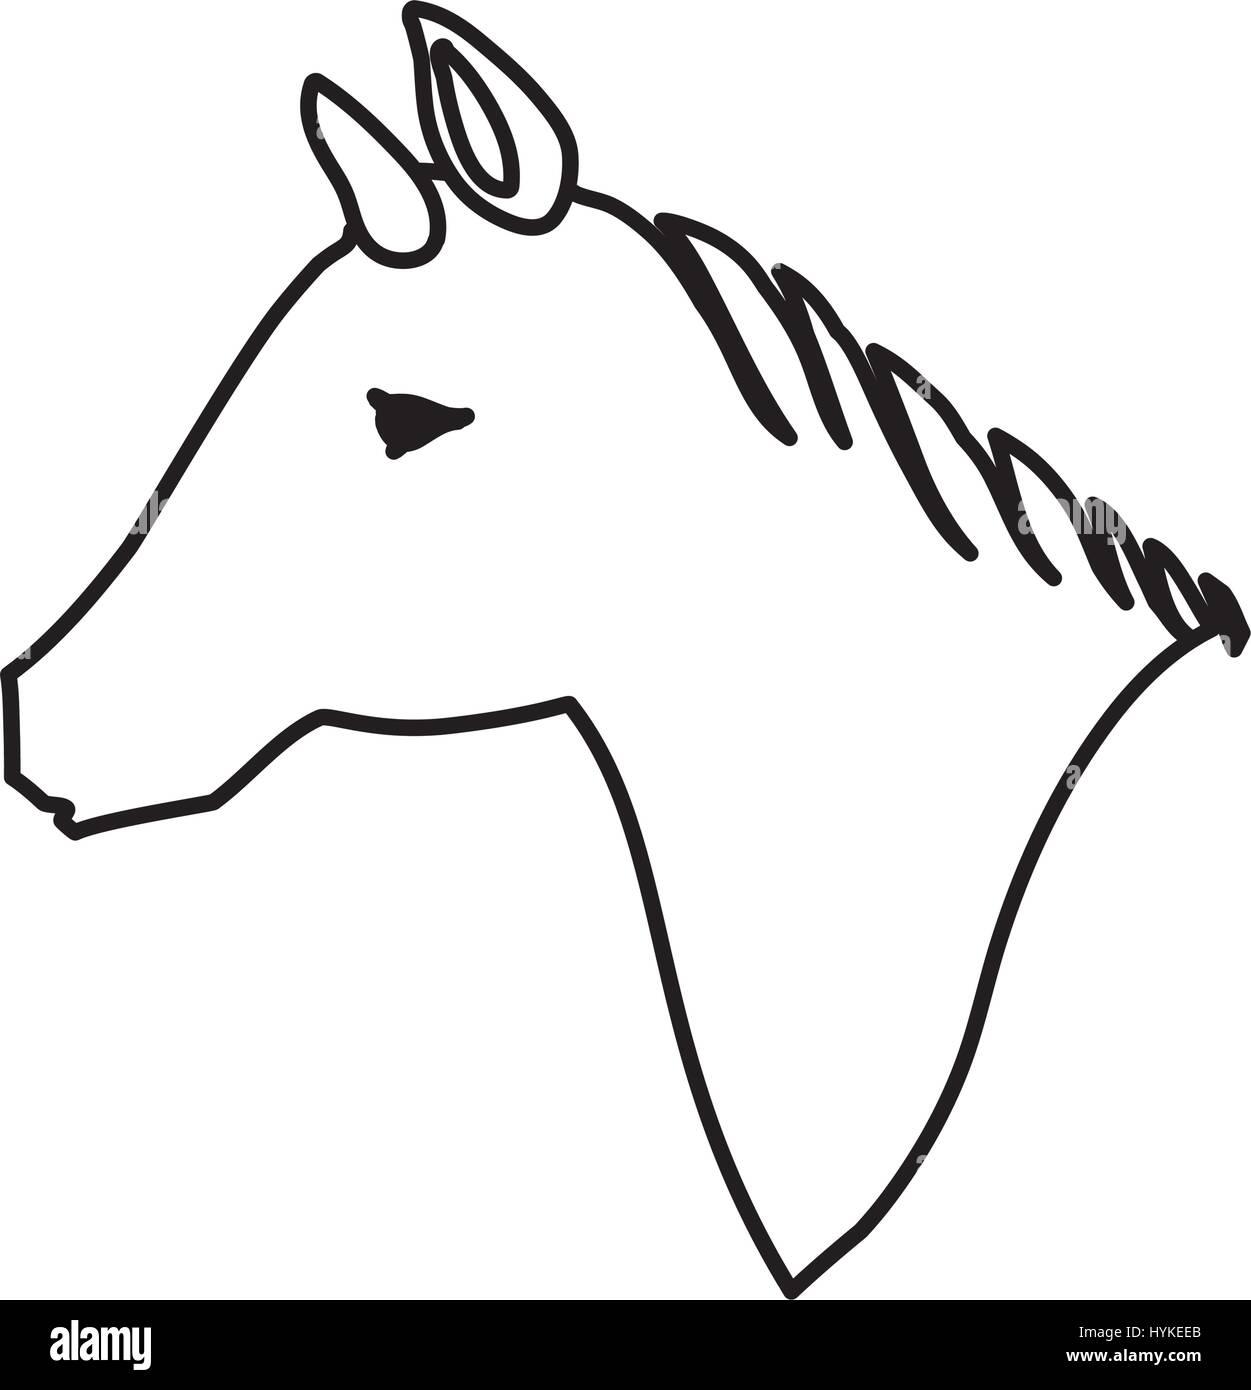 Horse animal silhouette - Stock Image